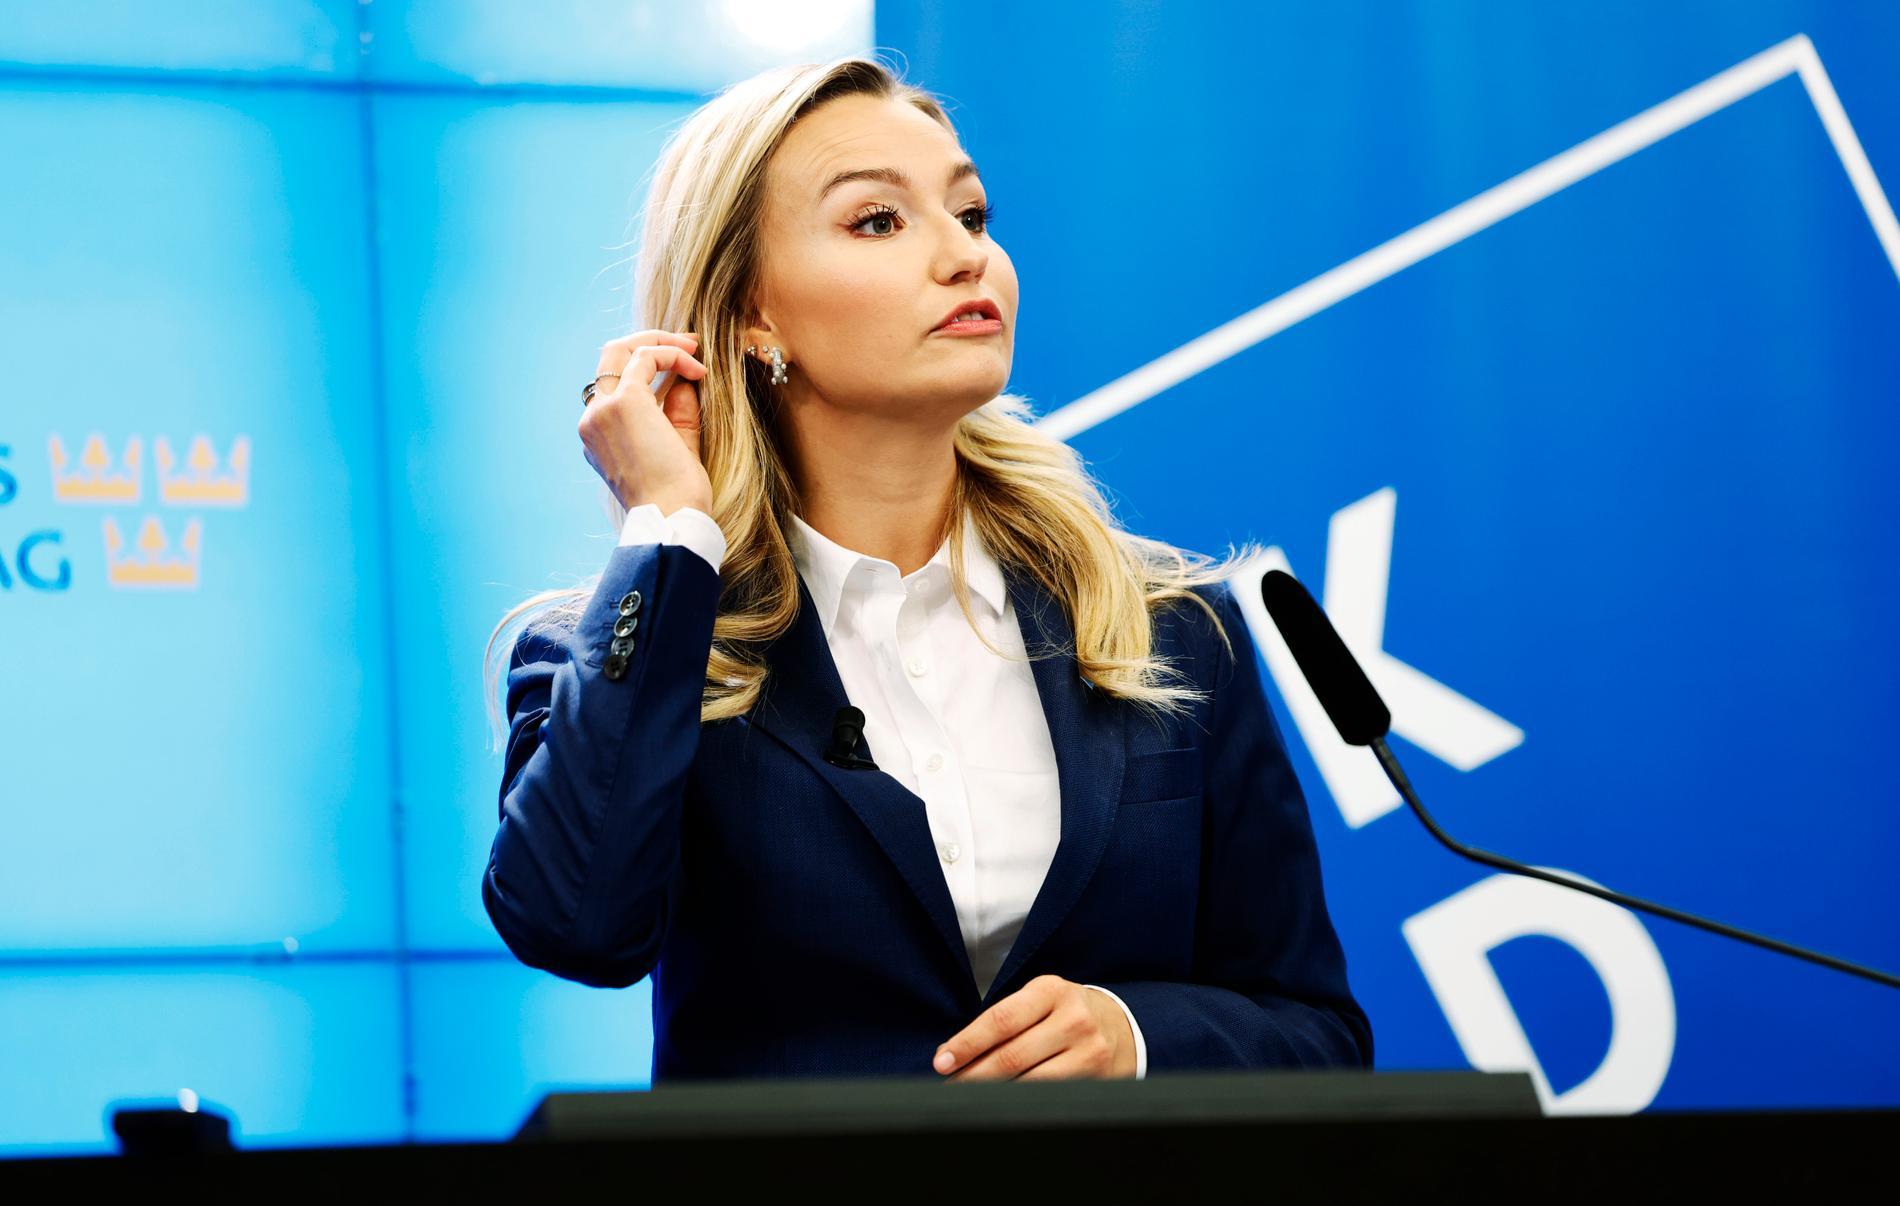 Kristdemokraternas partiledare Ebba Busch. Arkivbild.